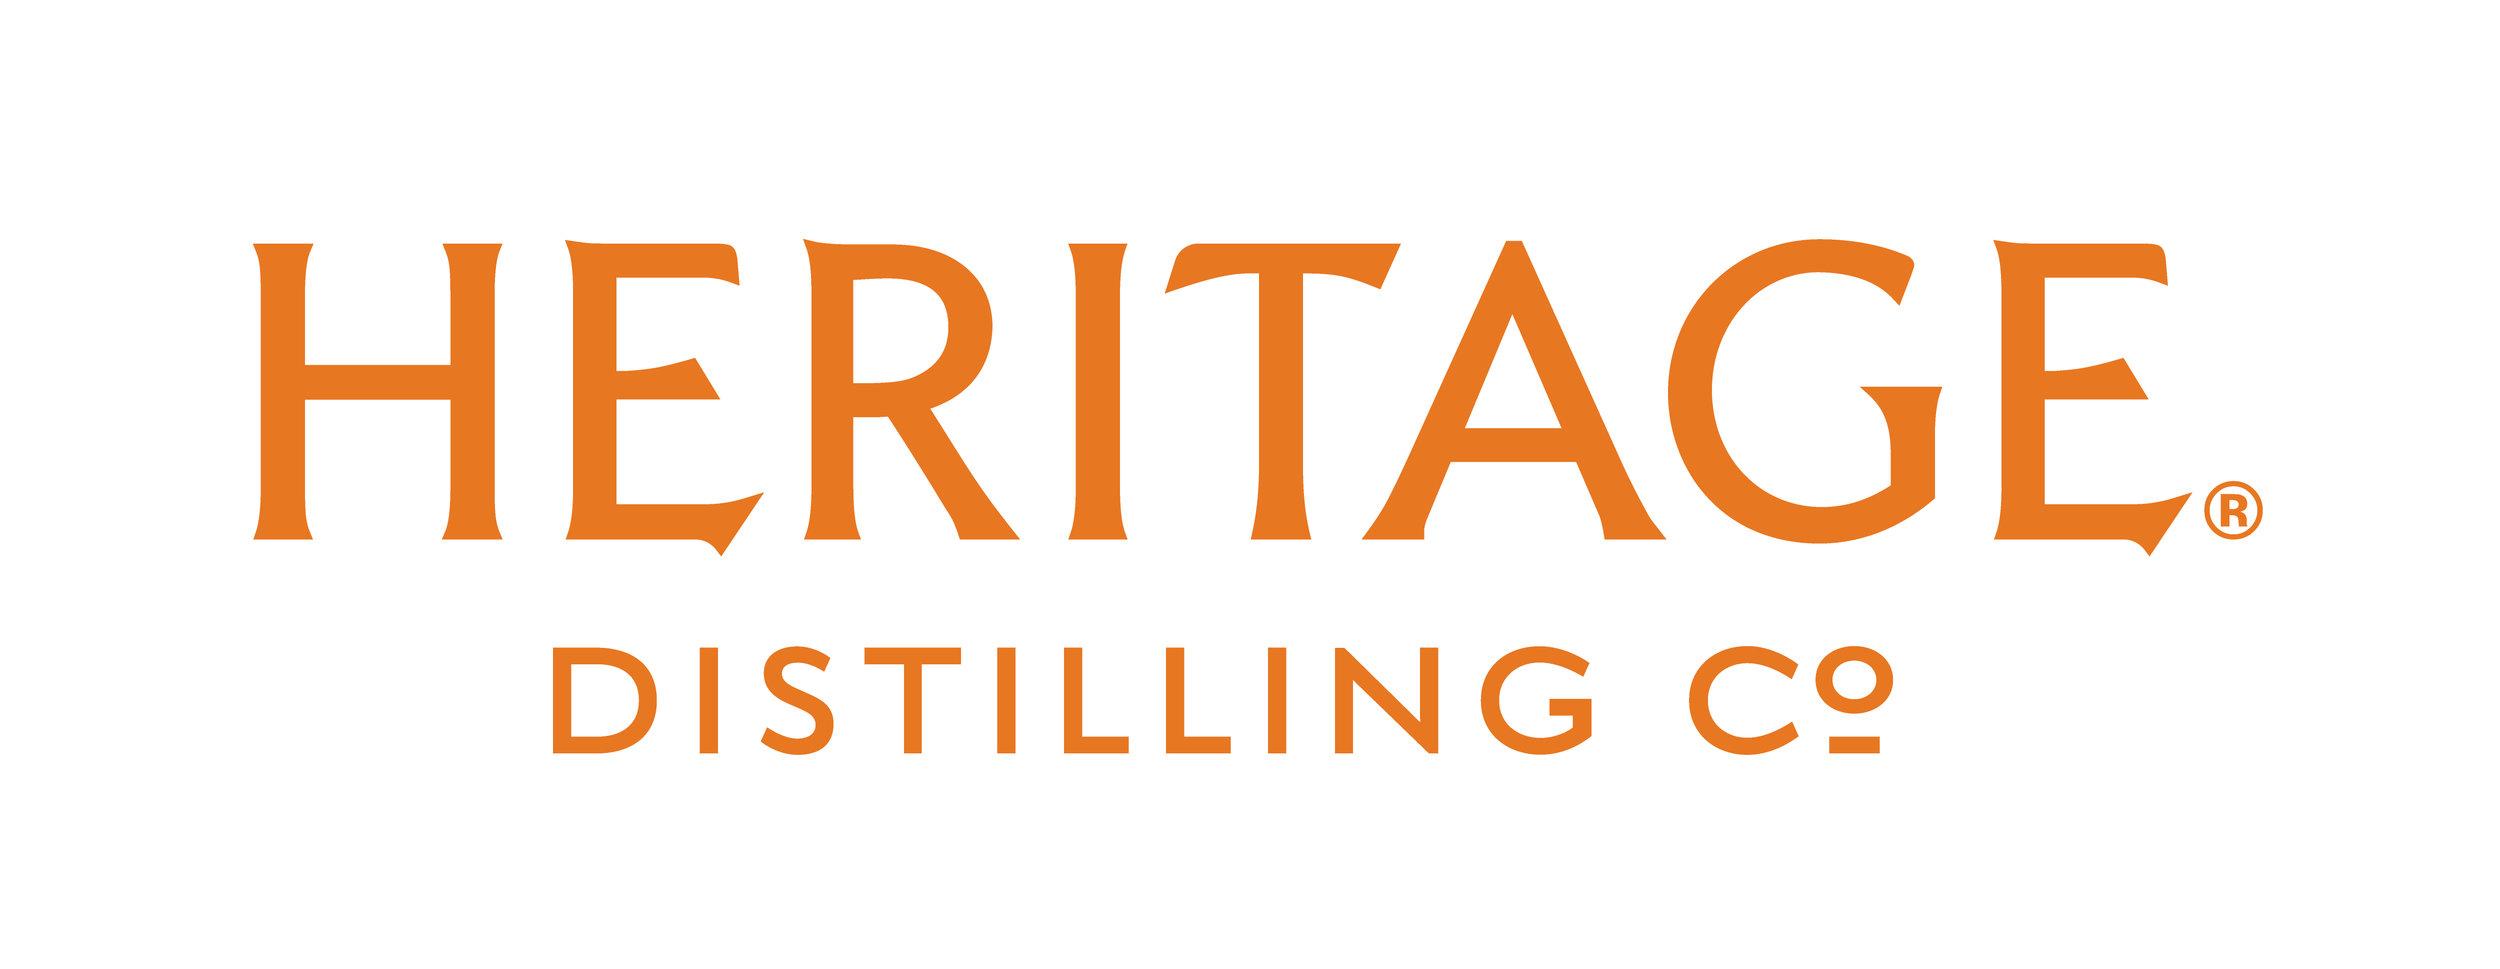 Heritage_Wordmark_Orange.jpg